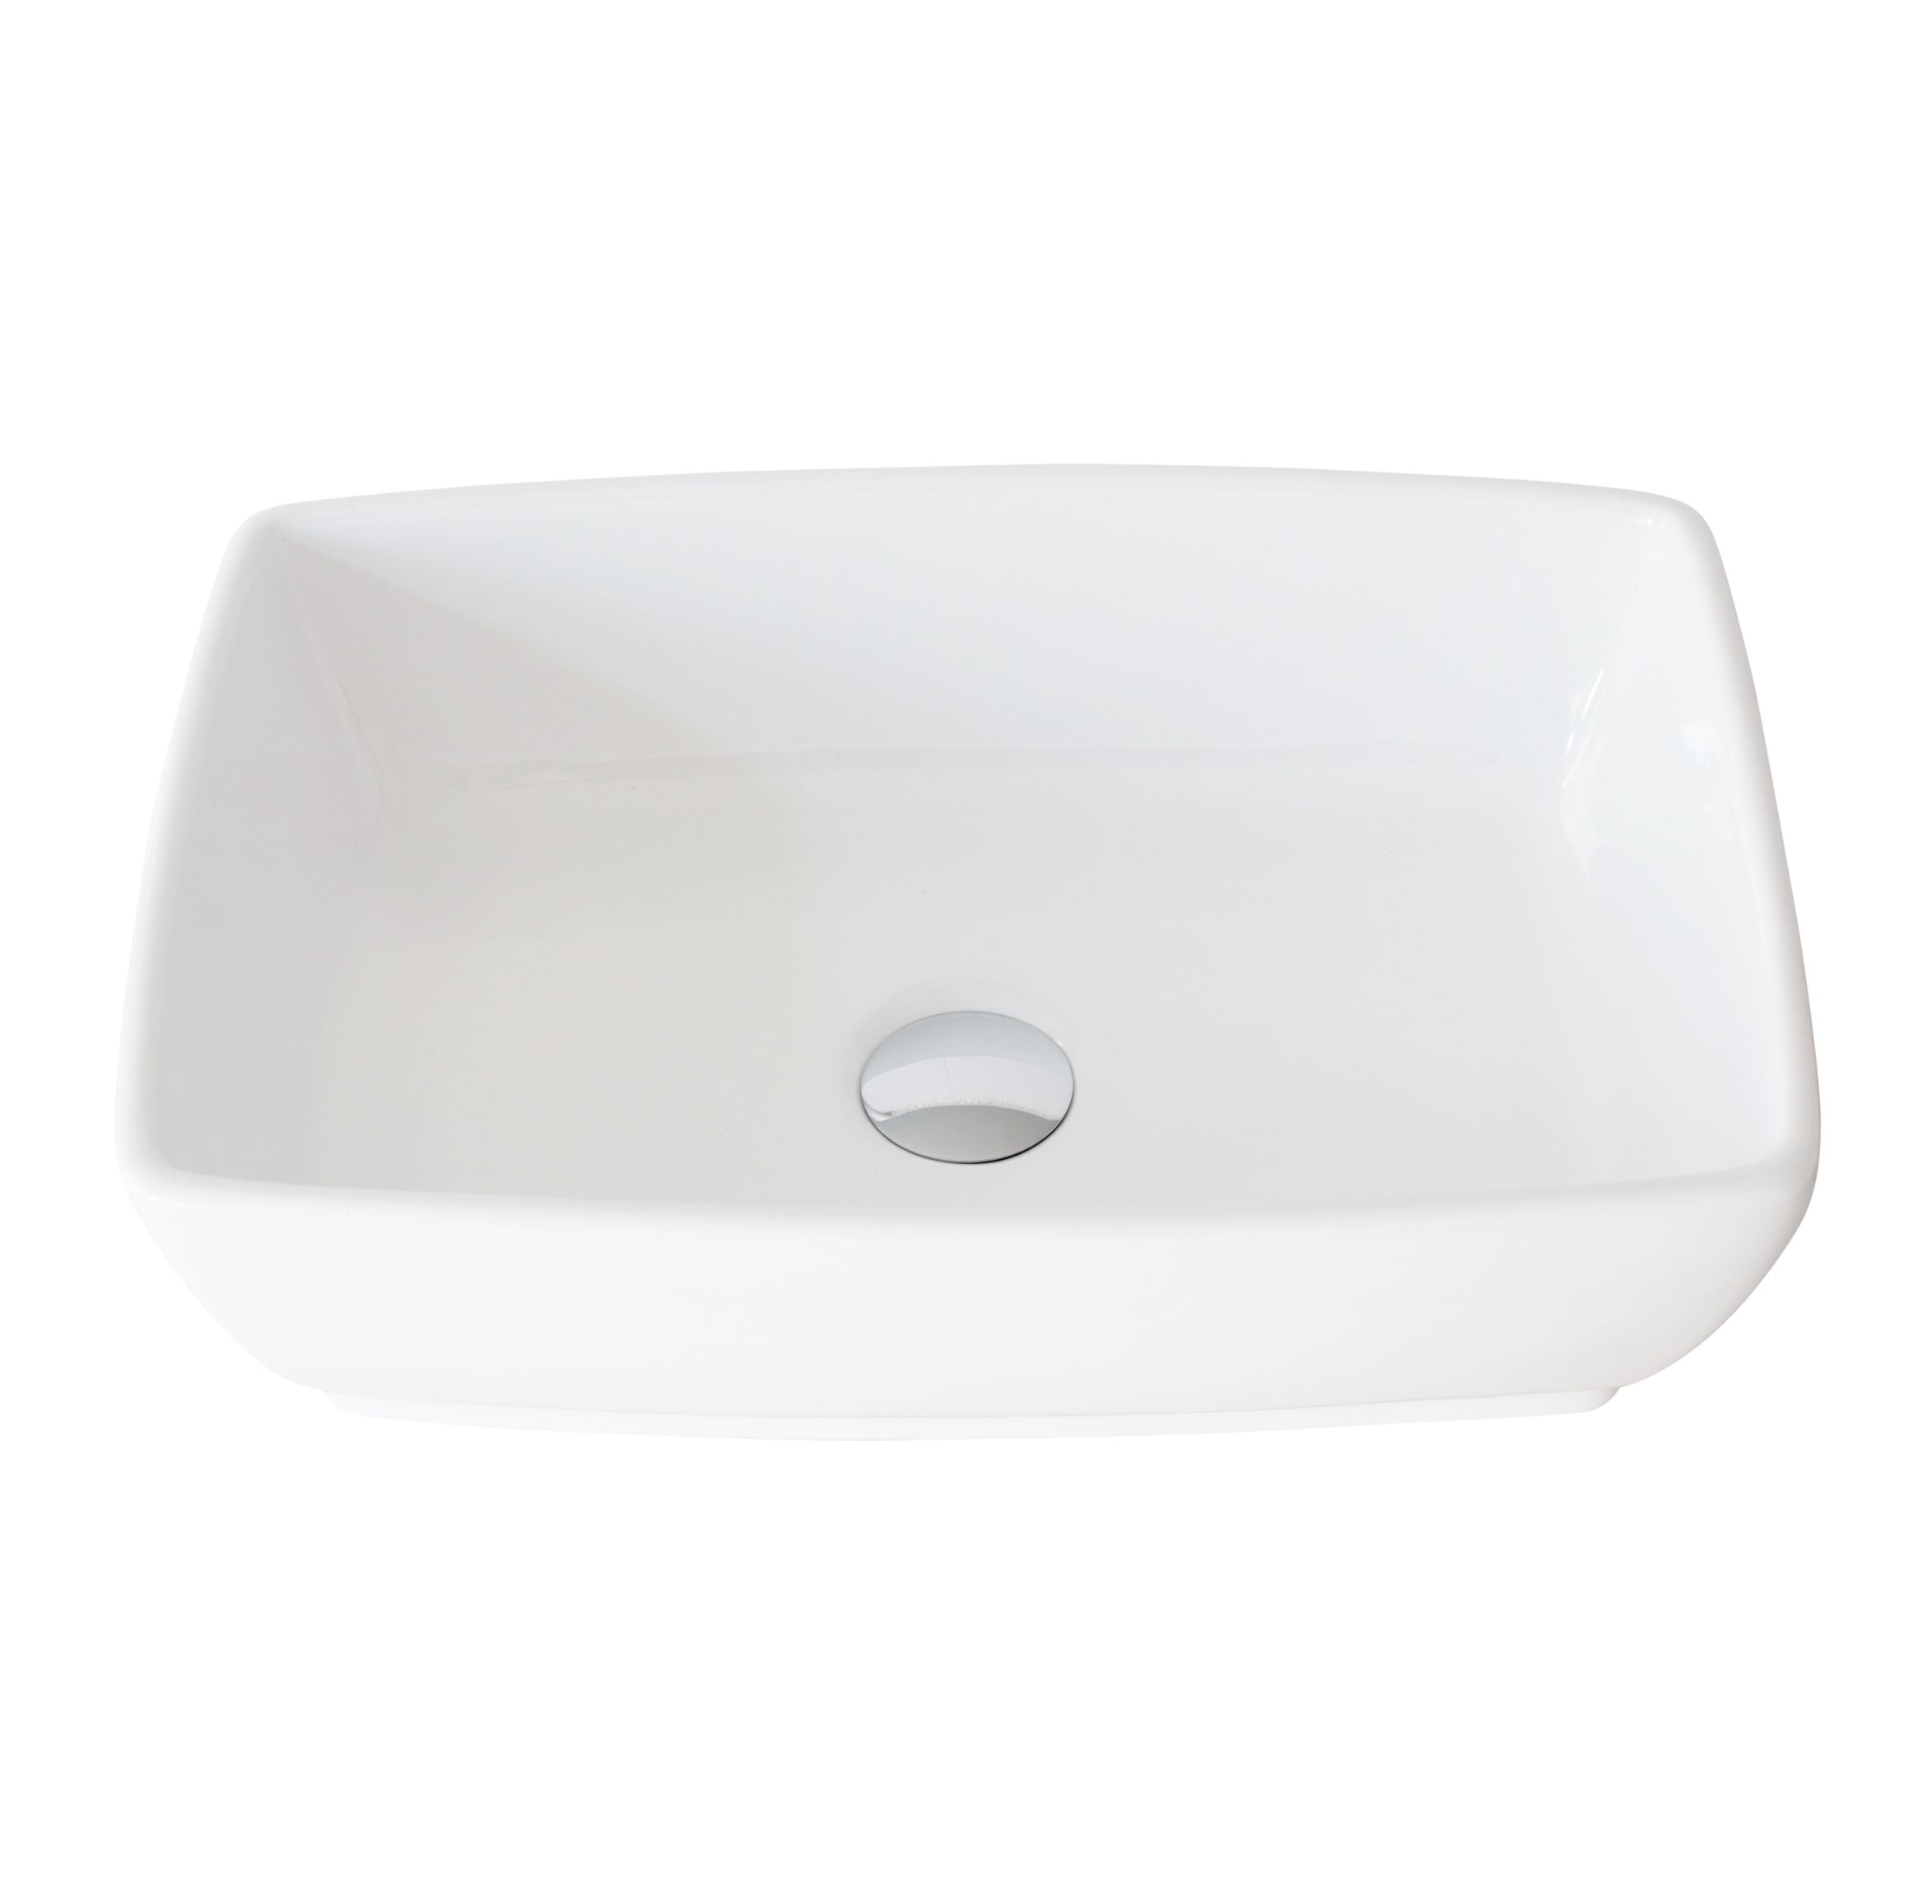 stylish 19 inch white rectangular